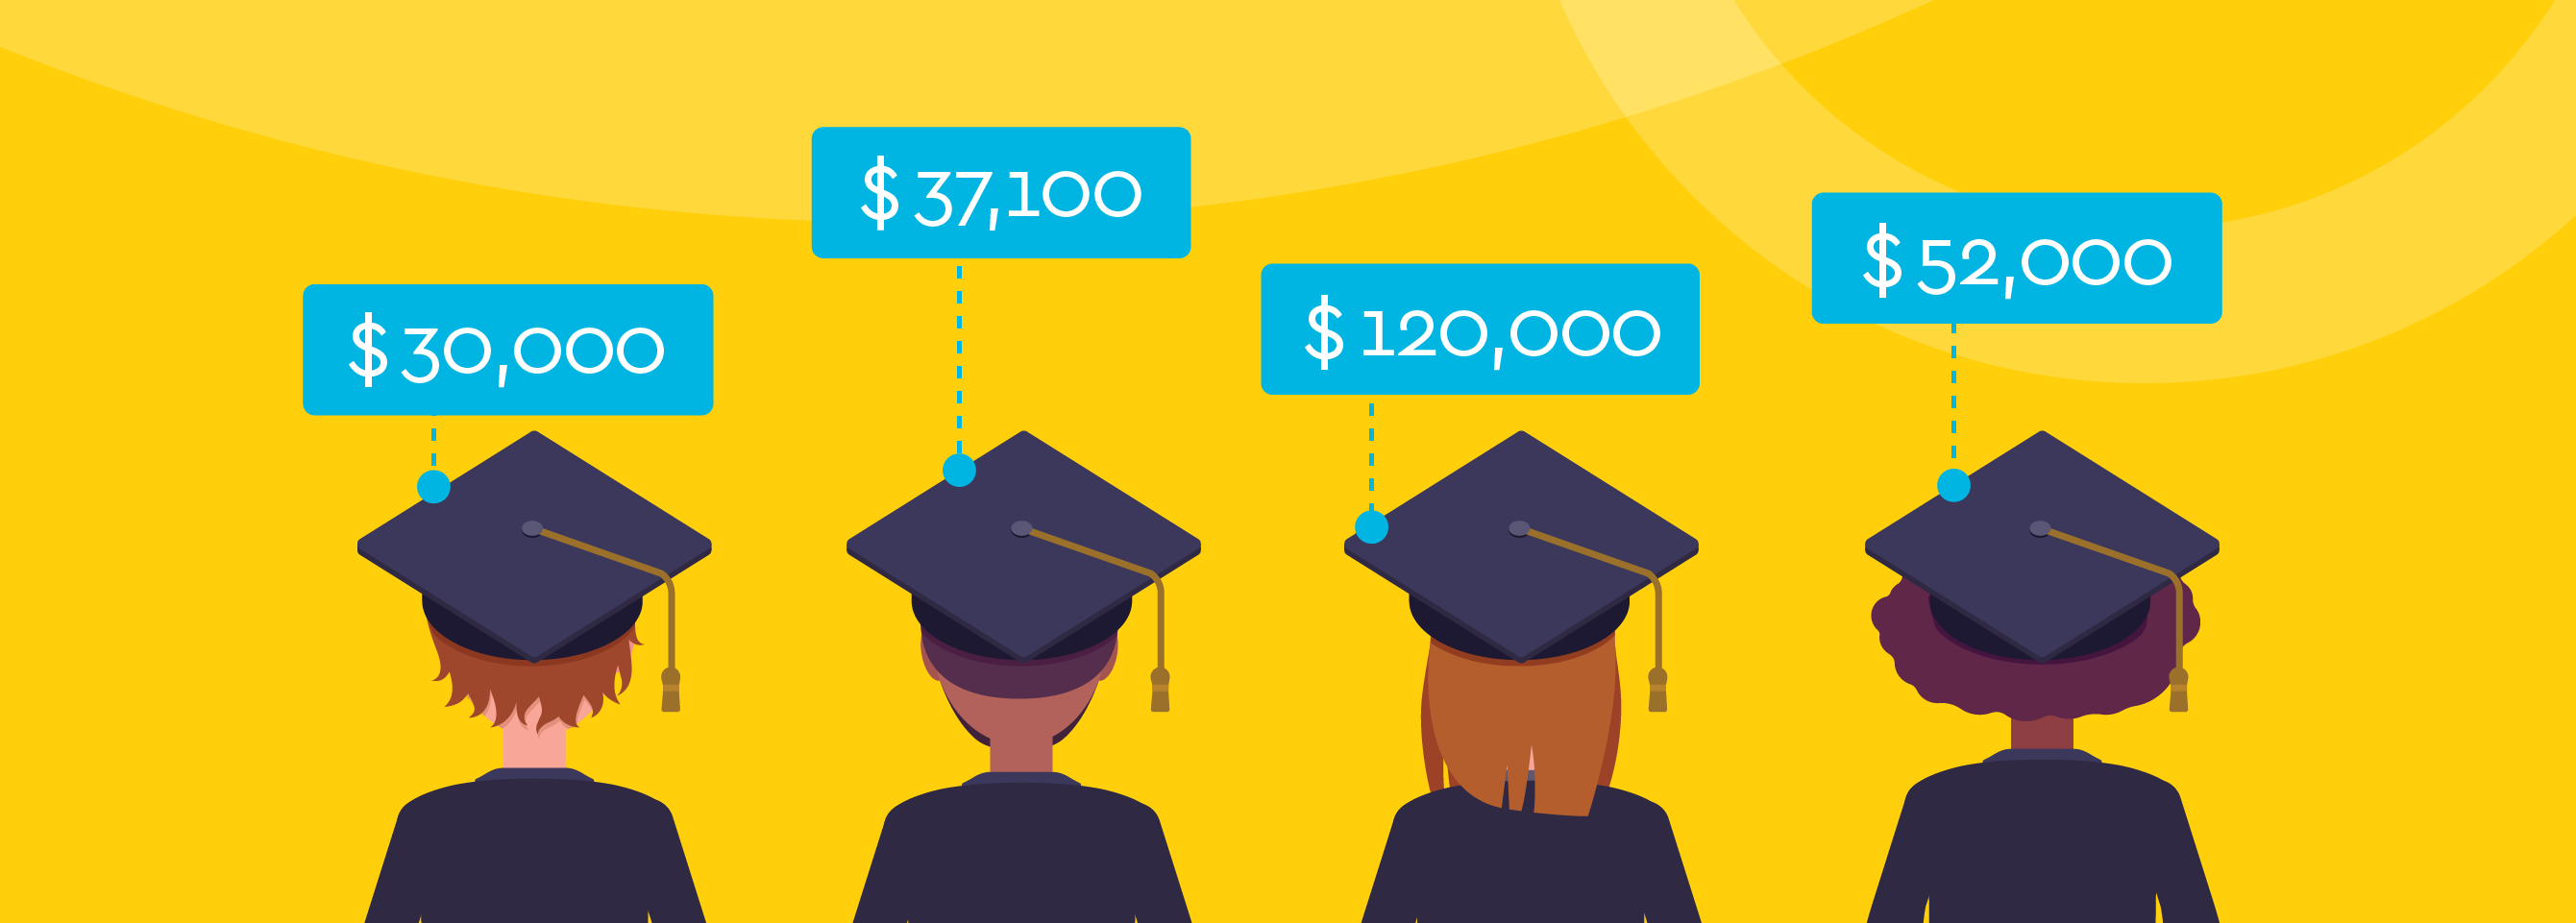 Student Loan Repayment Options | Commerce Bank